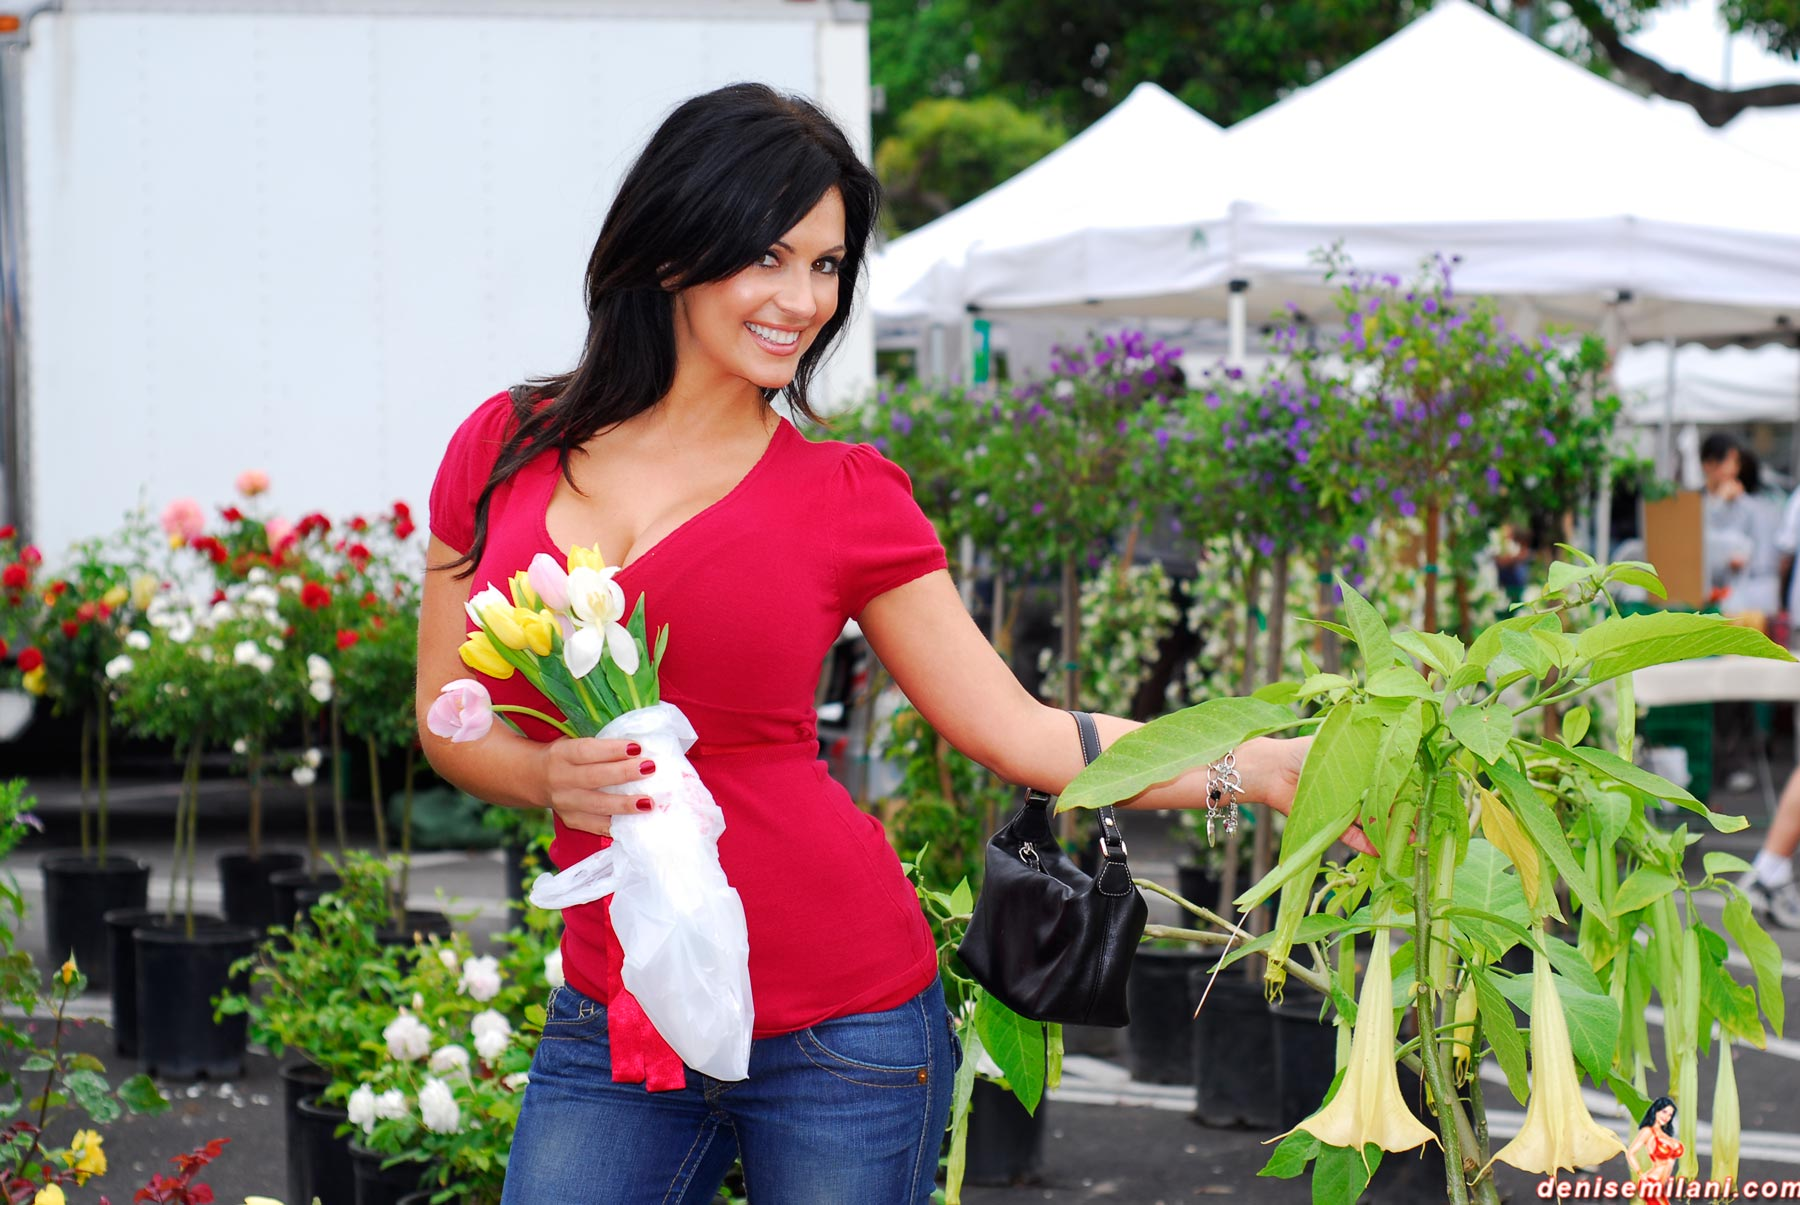 Denise Milani | At The Market